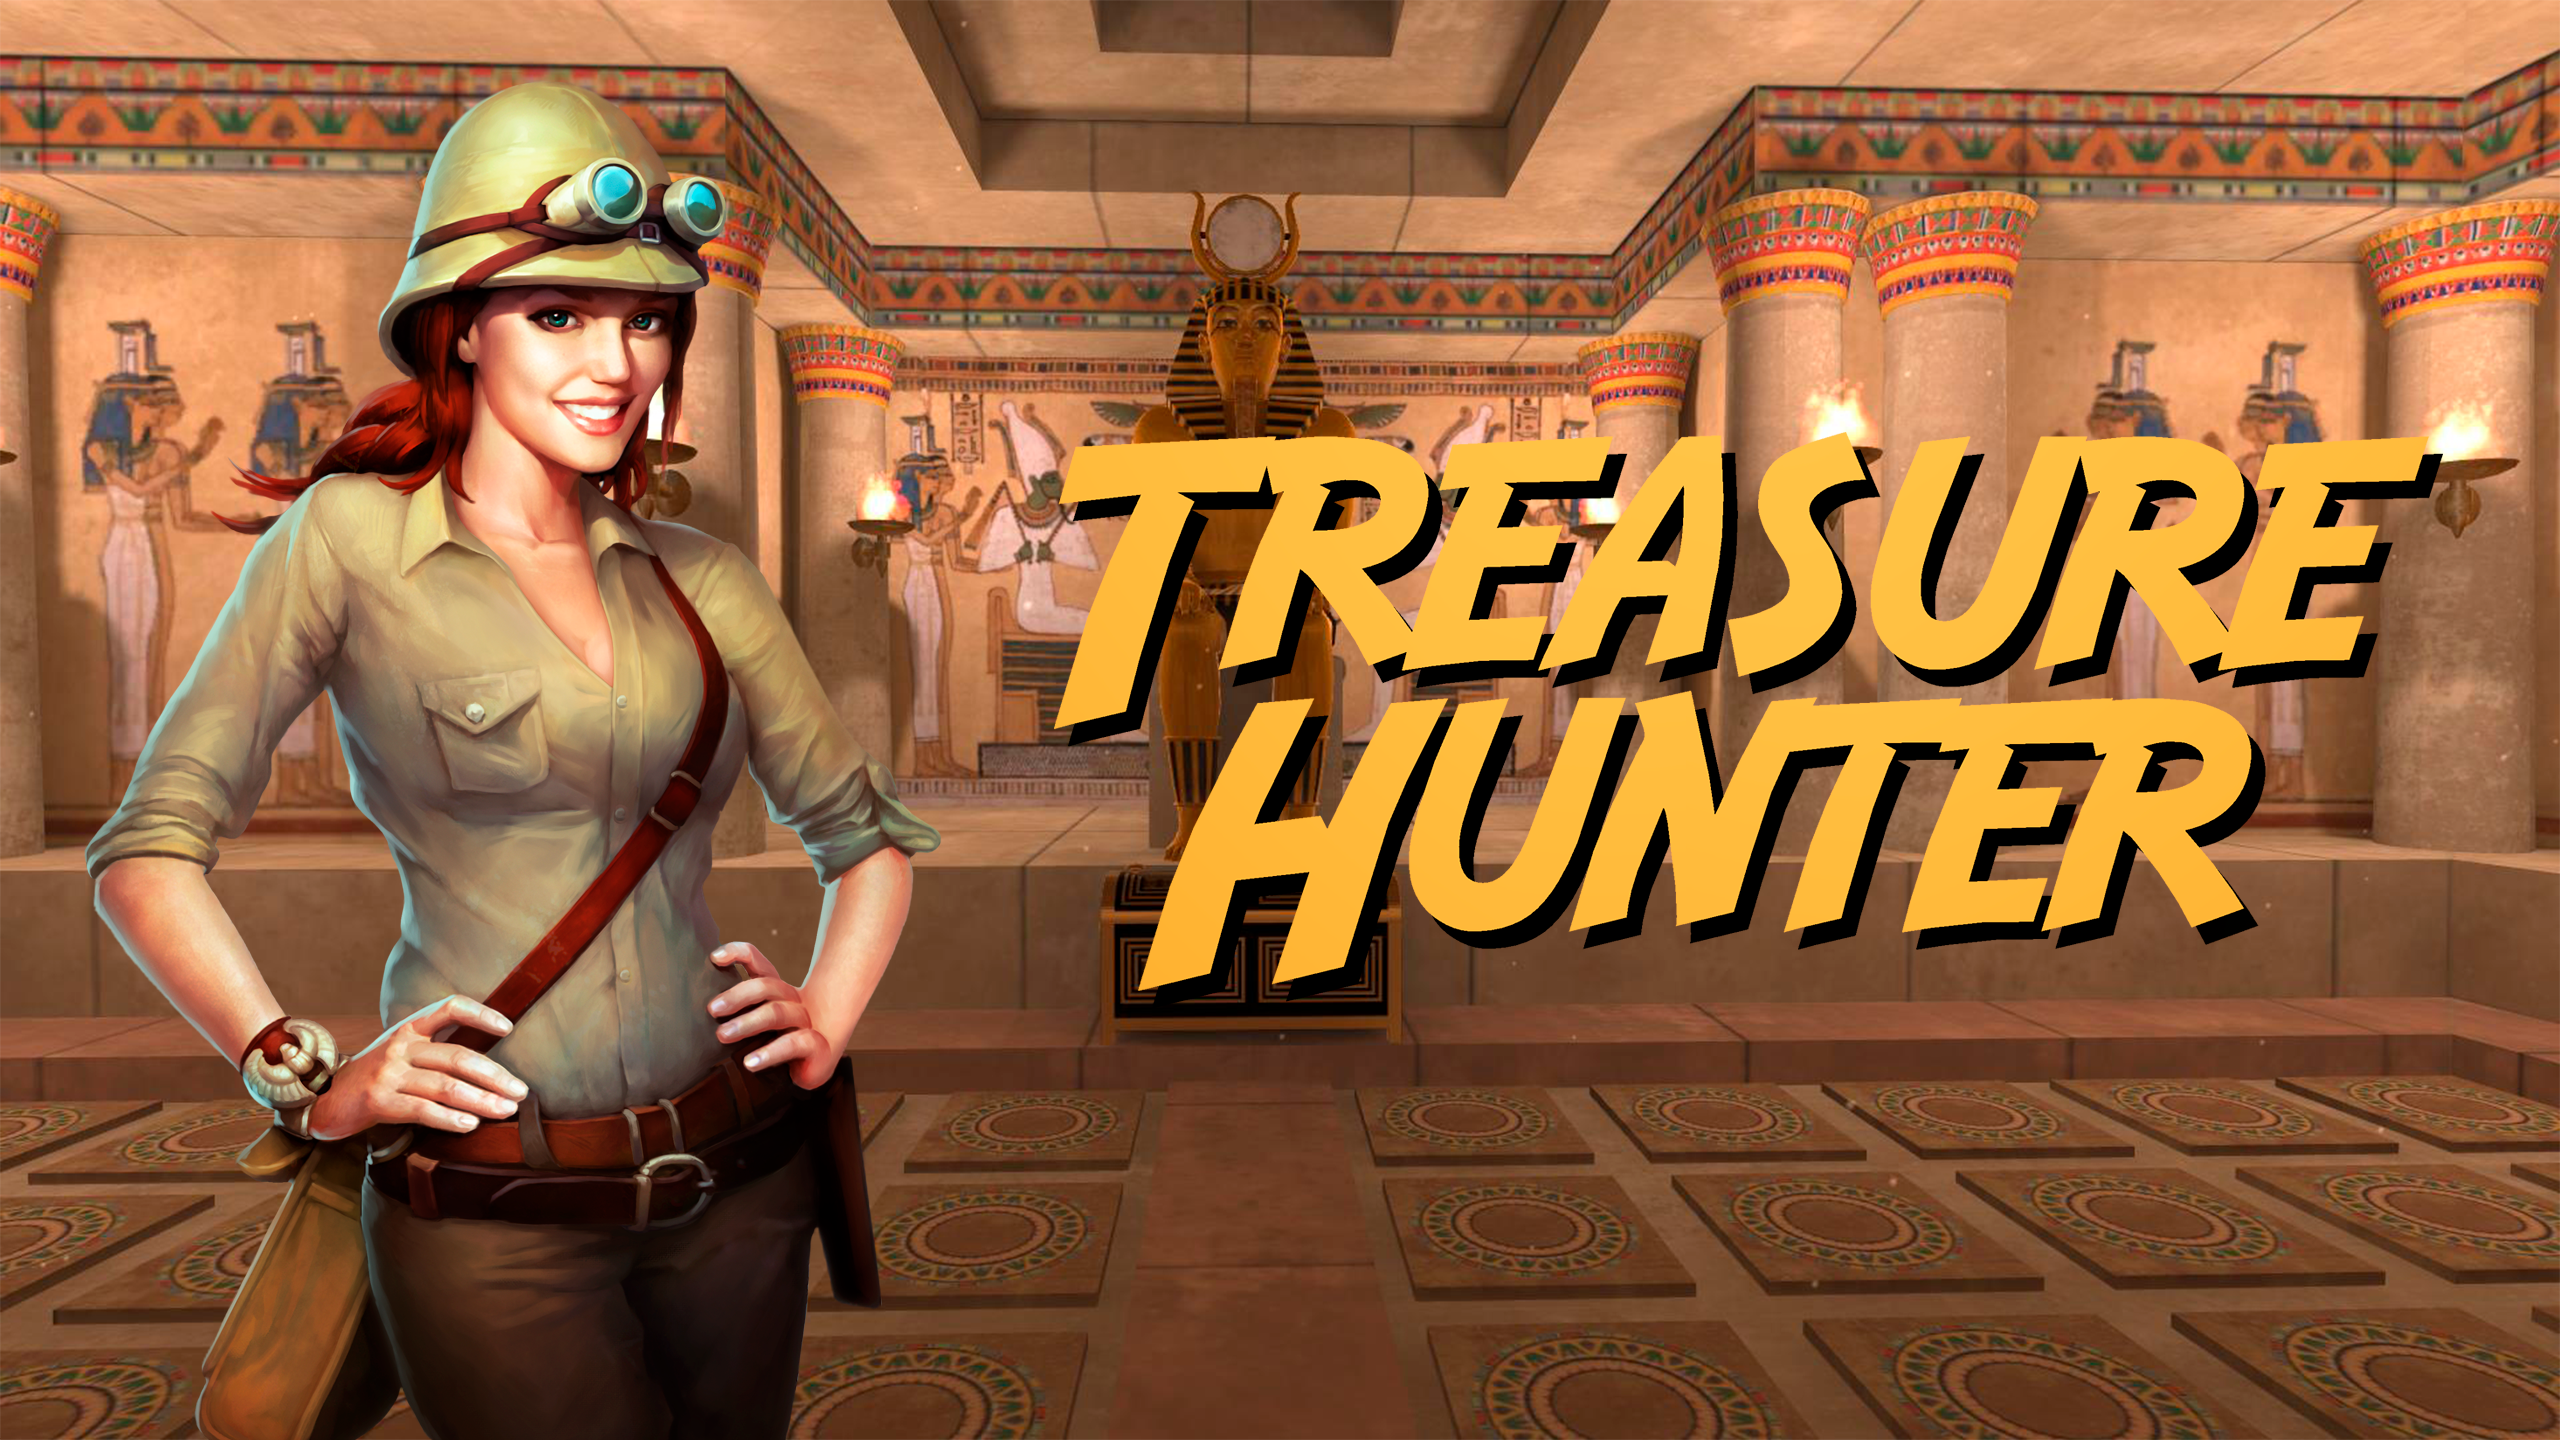 Treasure Hunter VR